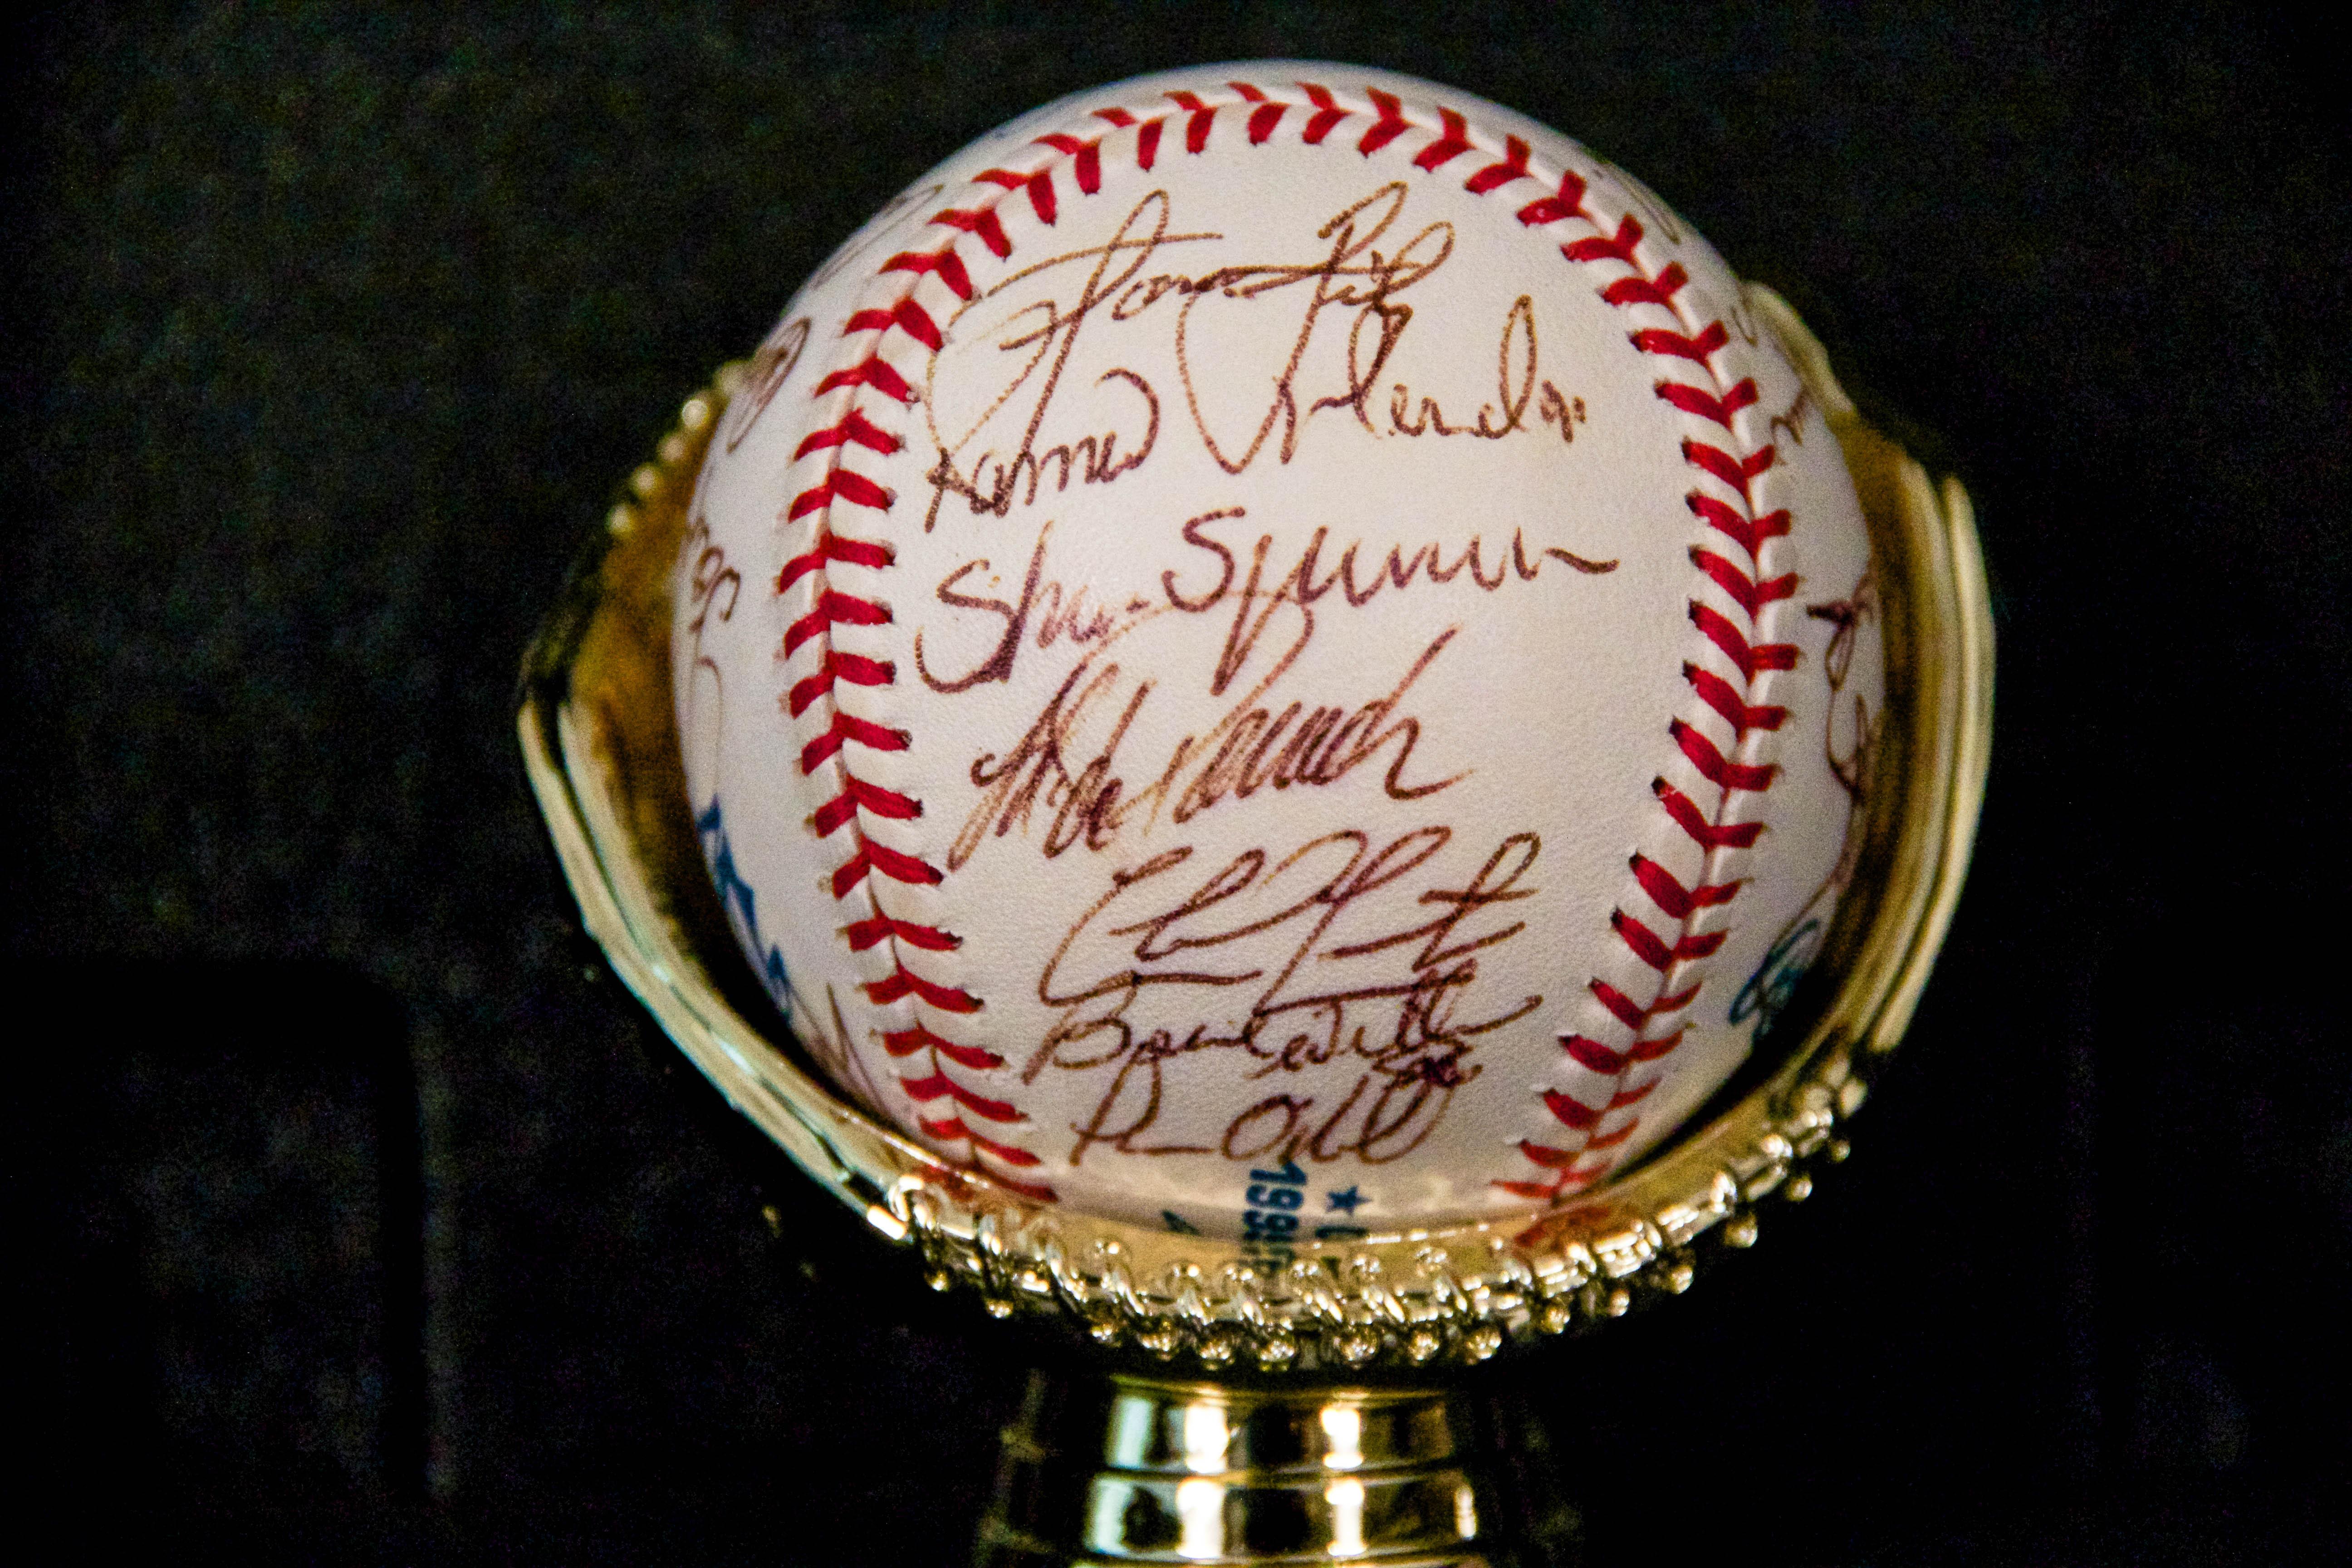 1999 World Series Champions